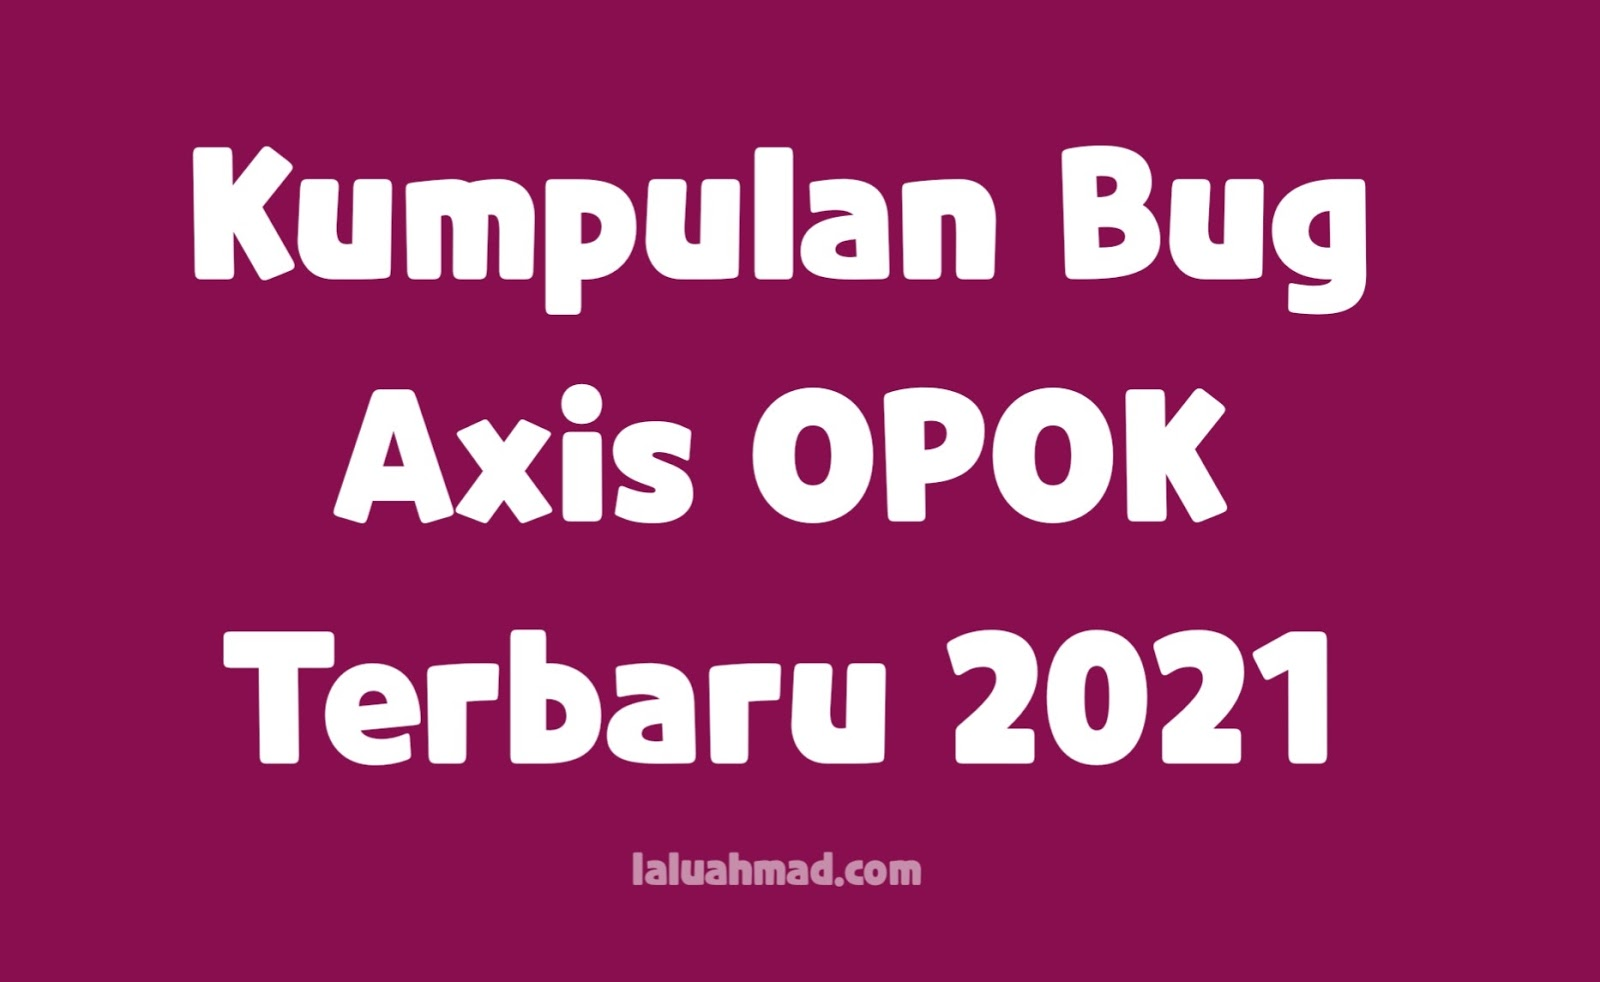 Kumpulan Bug Axis OPOK Terbaru 2021